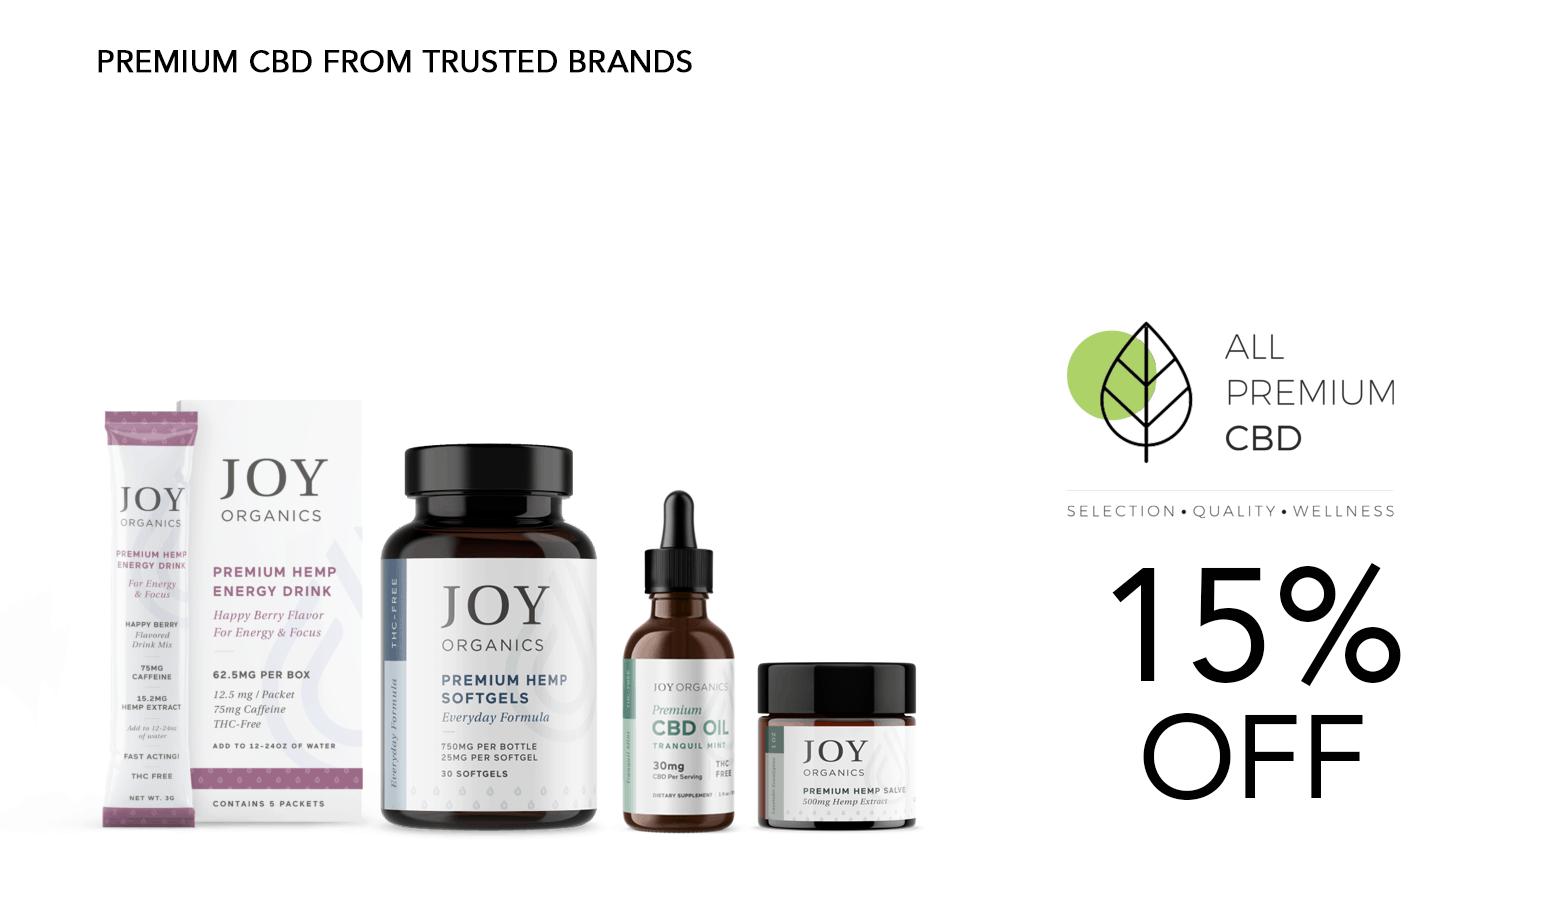 All Premium CBD Joy Organics Website